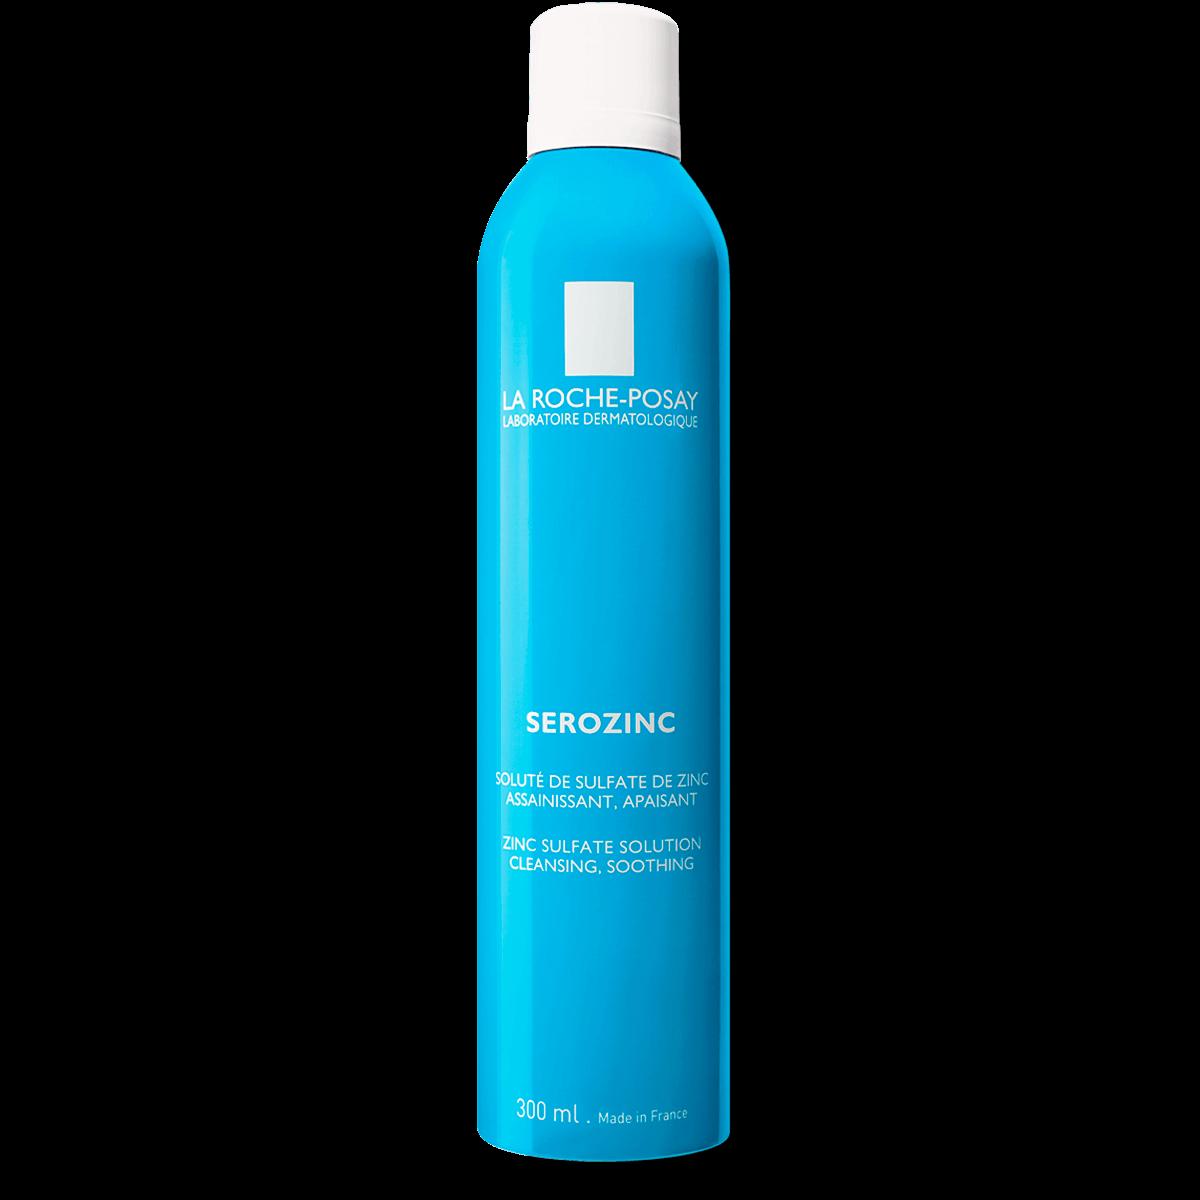 La Roche Posay Tuotesivu Serozinc Spray Zinc 300ml 3337875565783 Fro